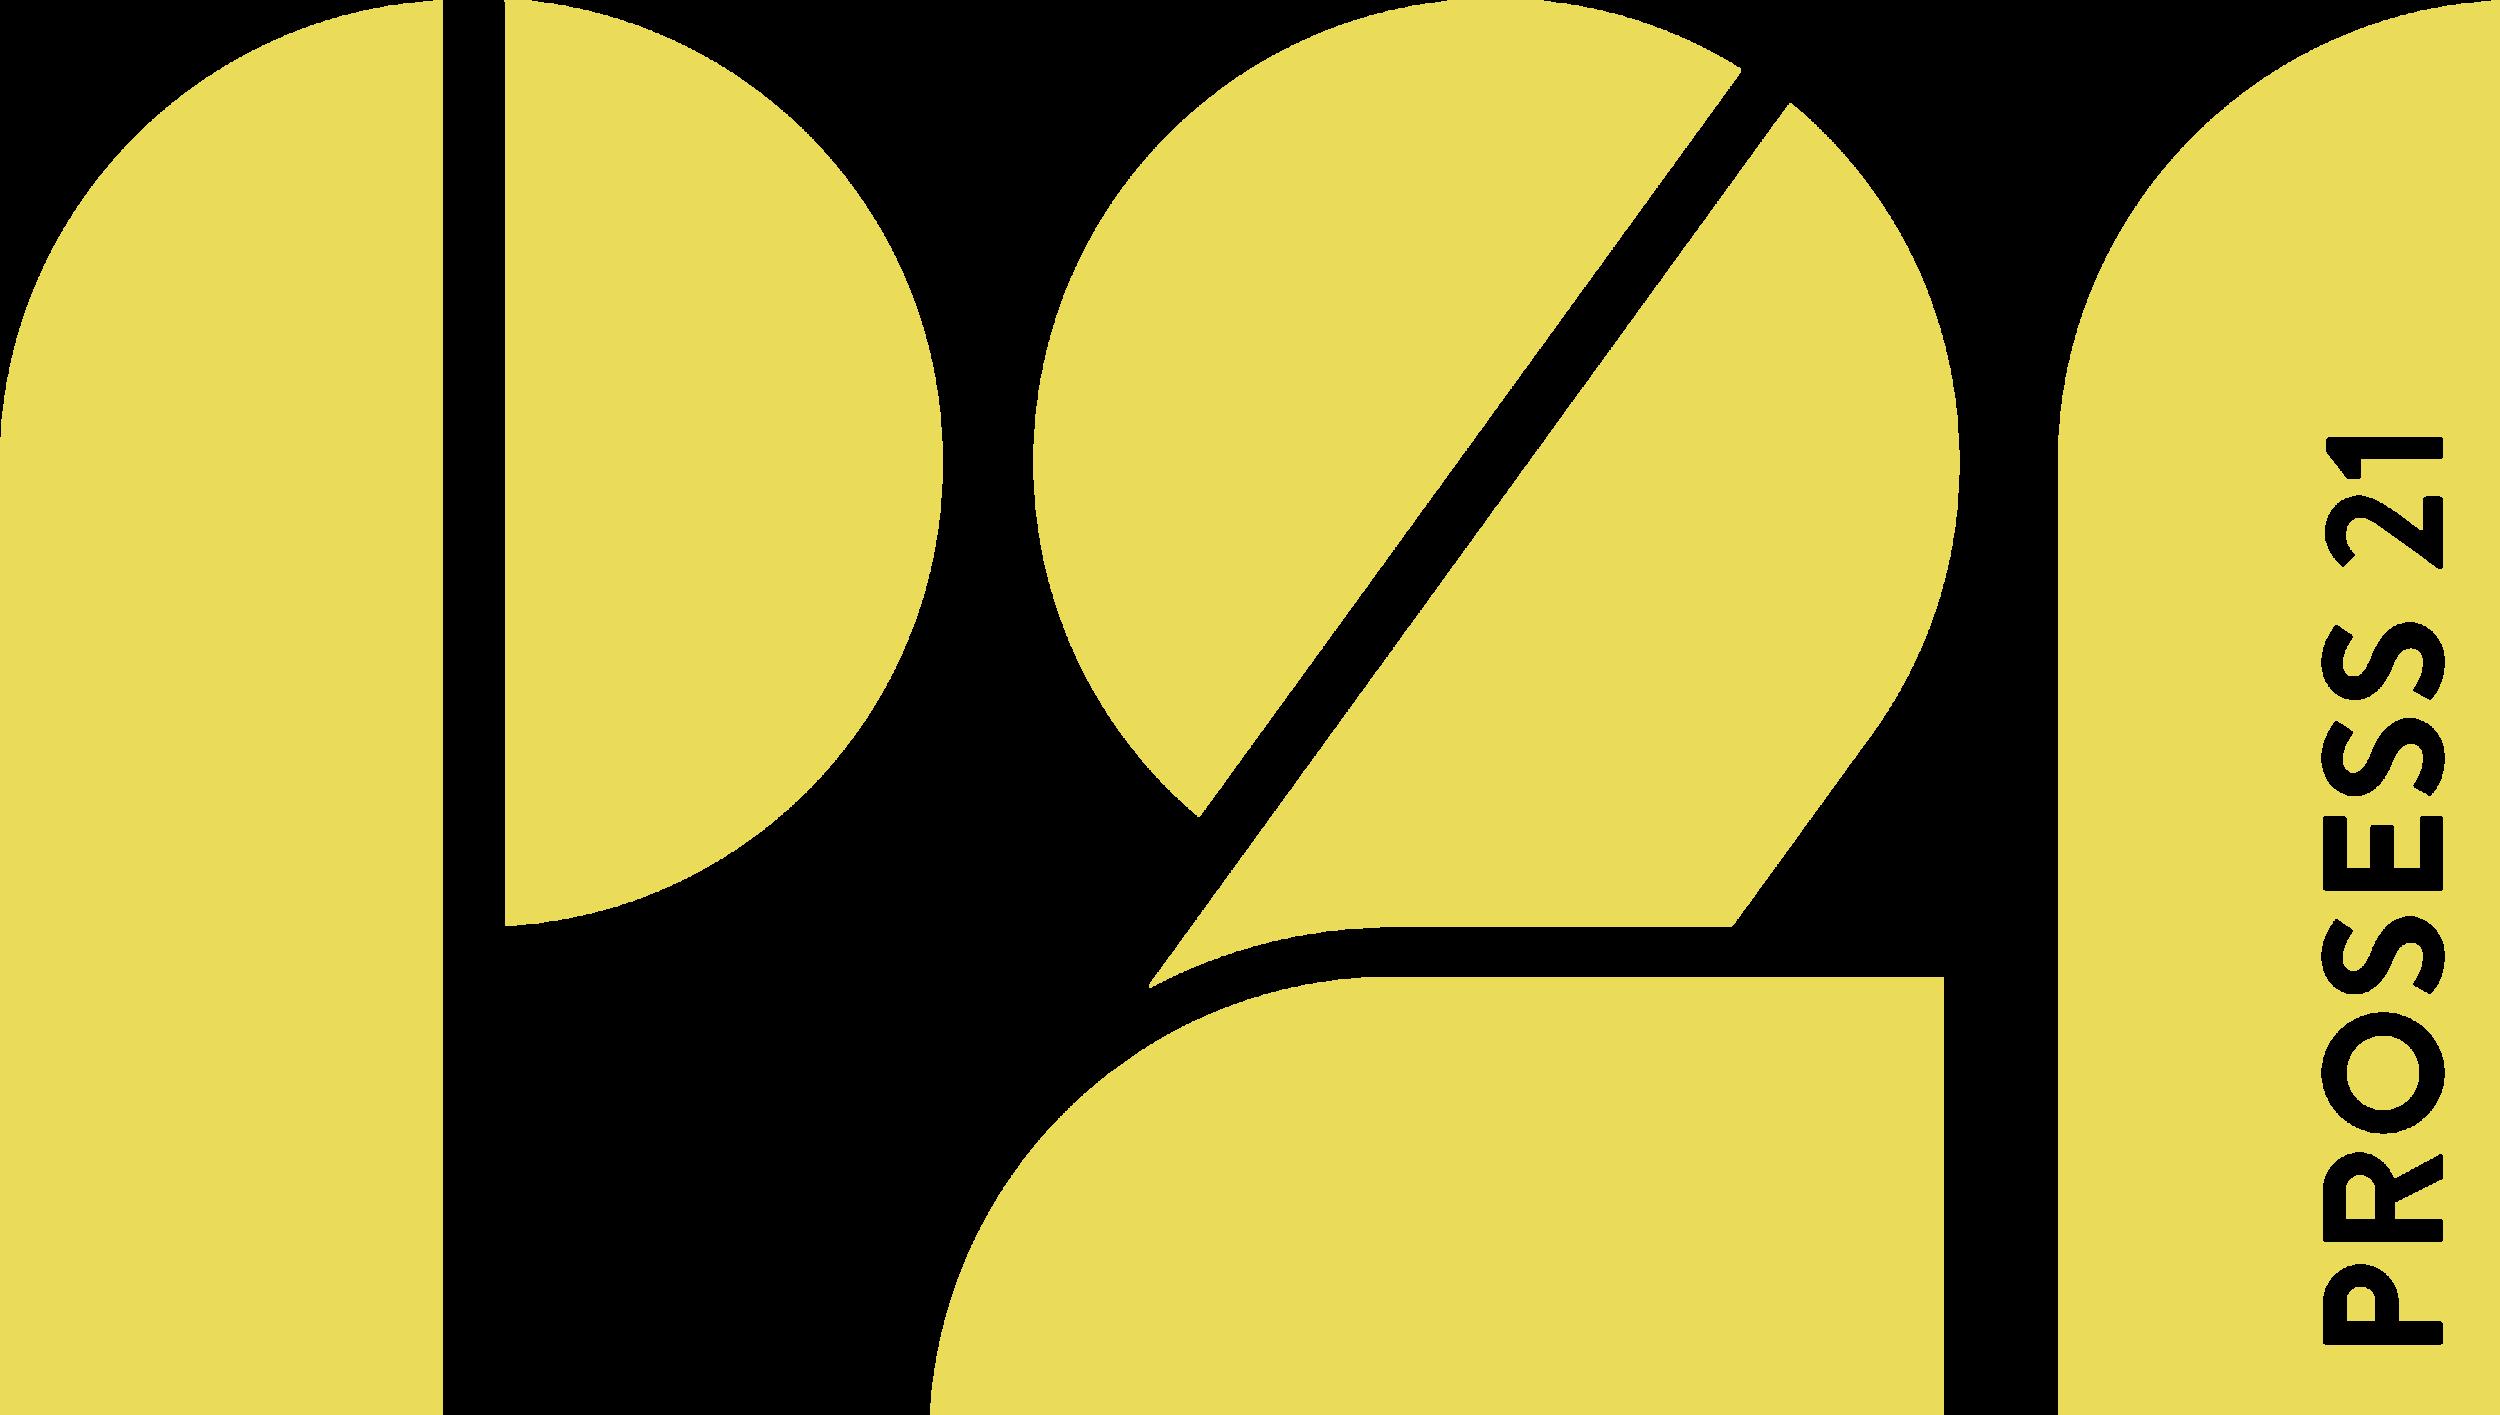 Prosess 21 logo gul